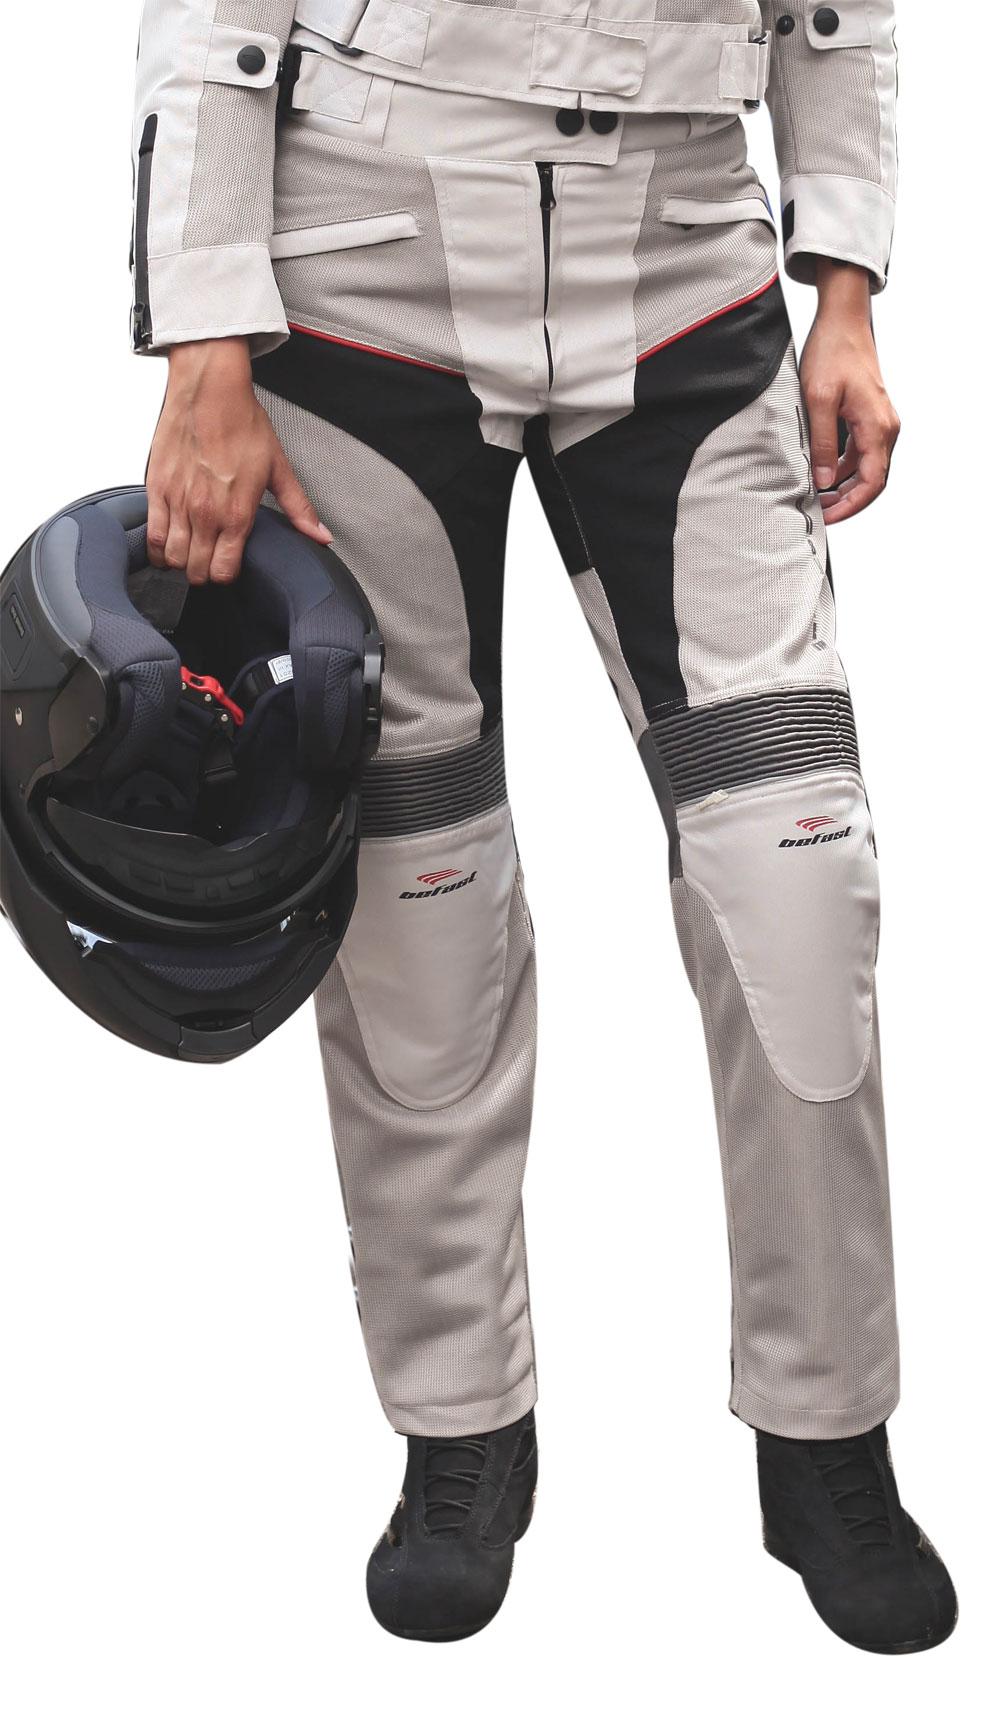 Pantaloni moto donna estivi Befast Sirio Lady Grigio